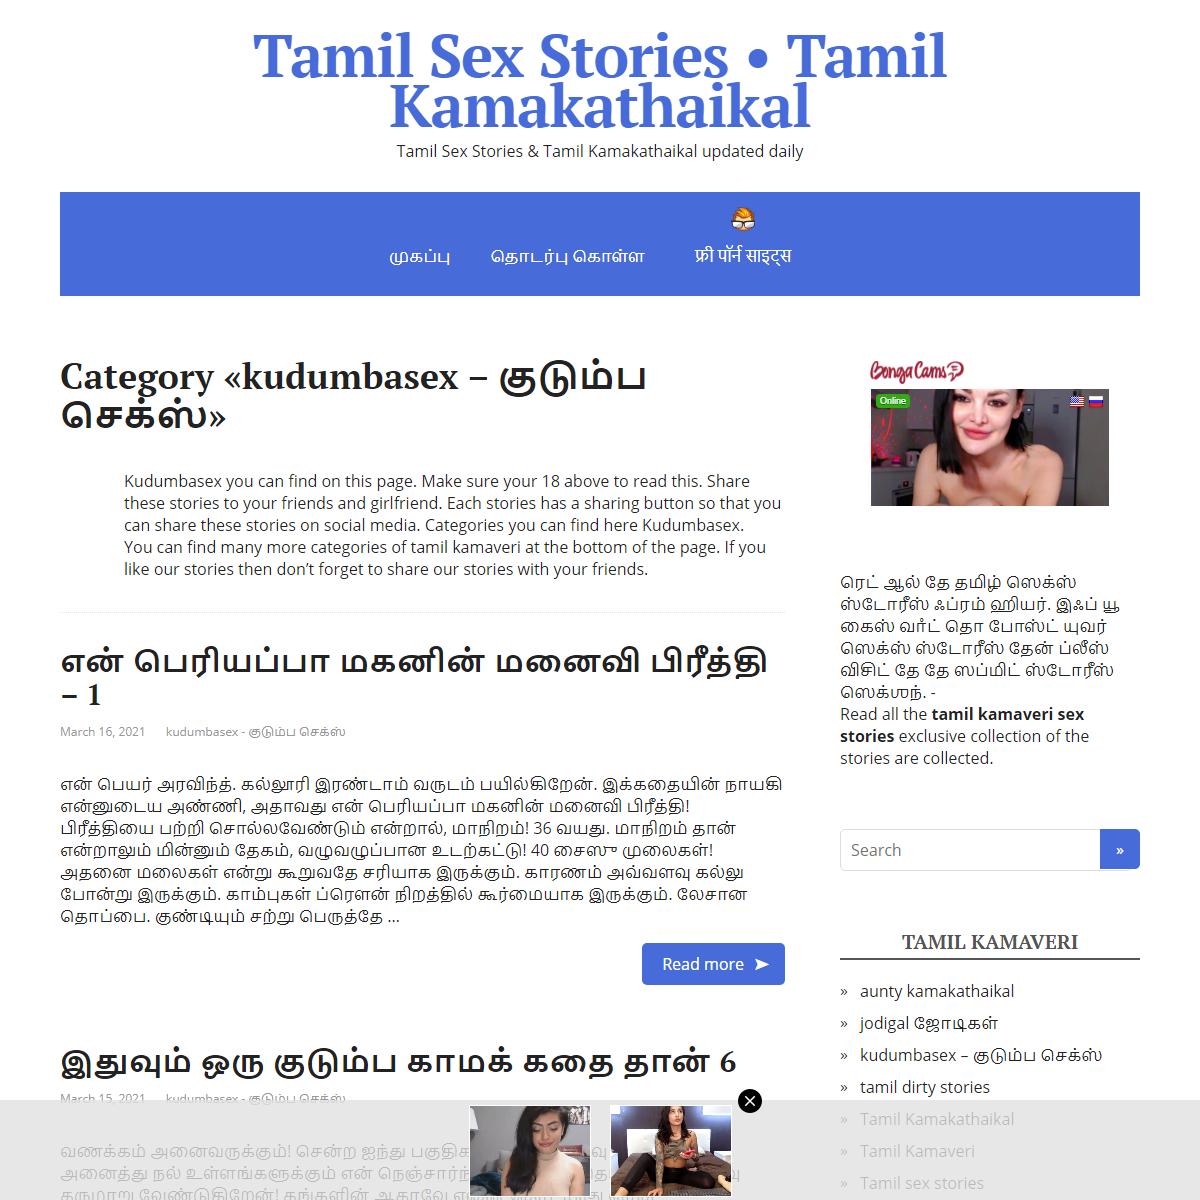 kudumbasex - குடும்ப செக்ஸ் - tamil dirty stories